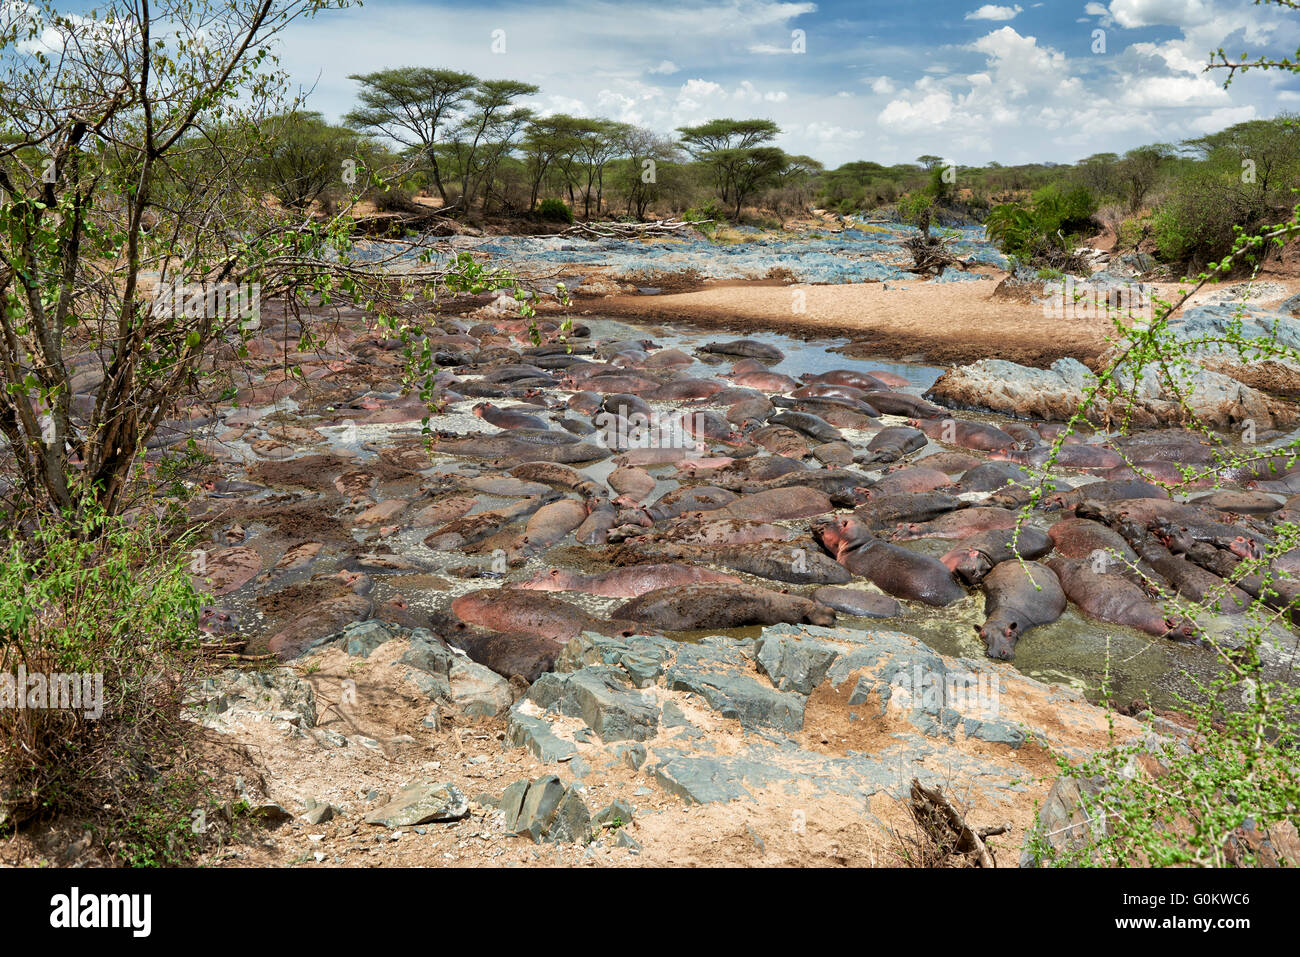 huge amount of Hippos (Hippopotamus amphibius) in famous Hippo-Pool of  Serengeti National Park,Tanzania,Afrika - Stock Image